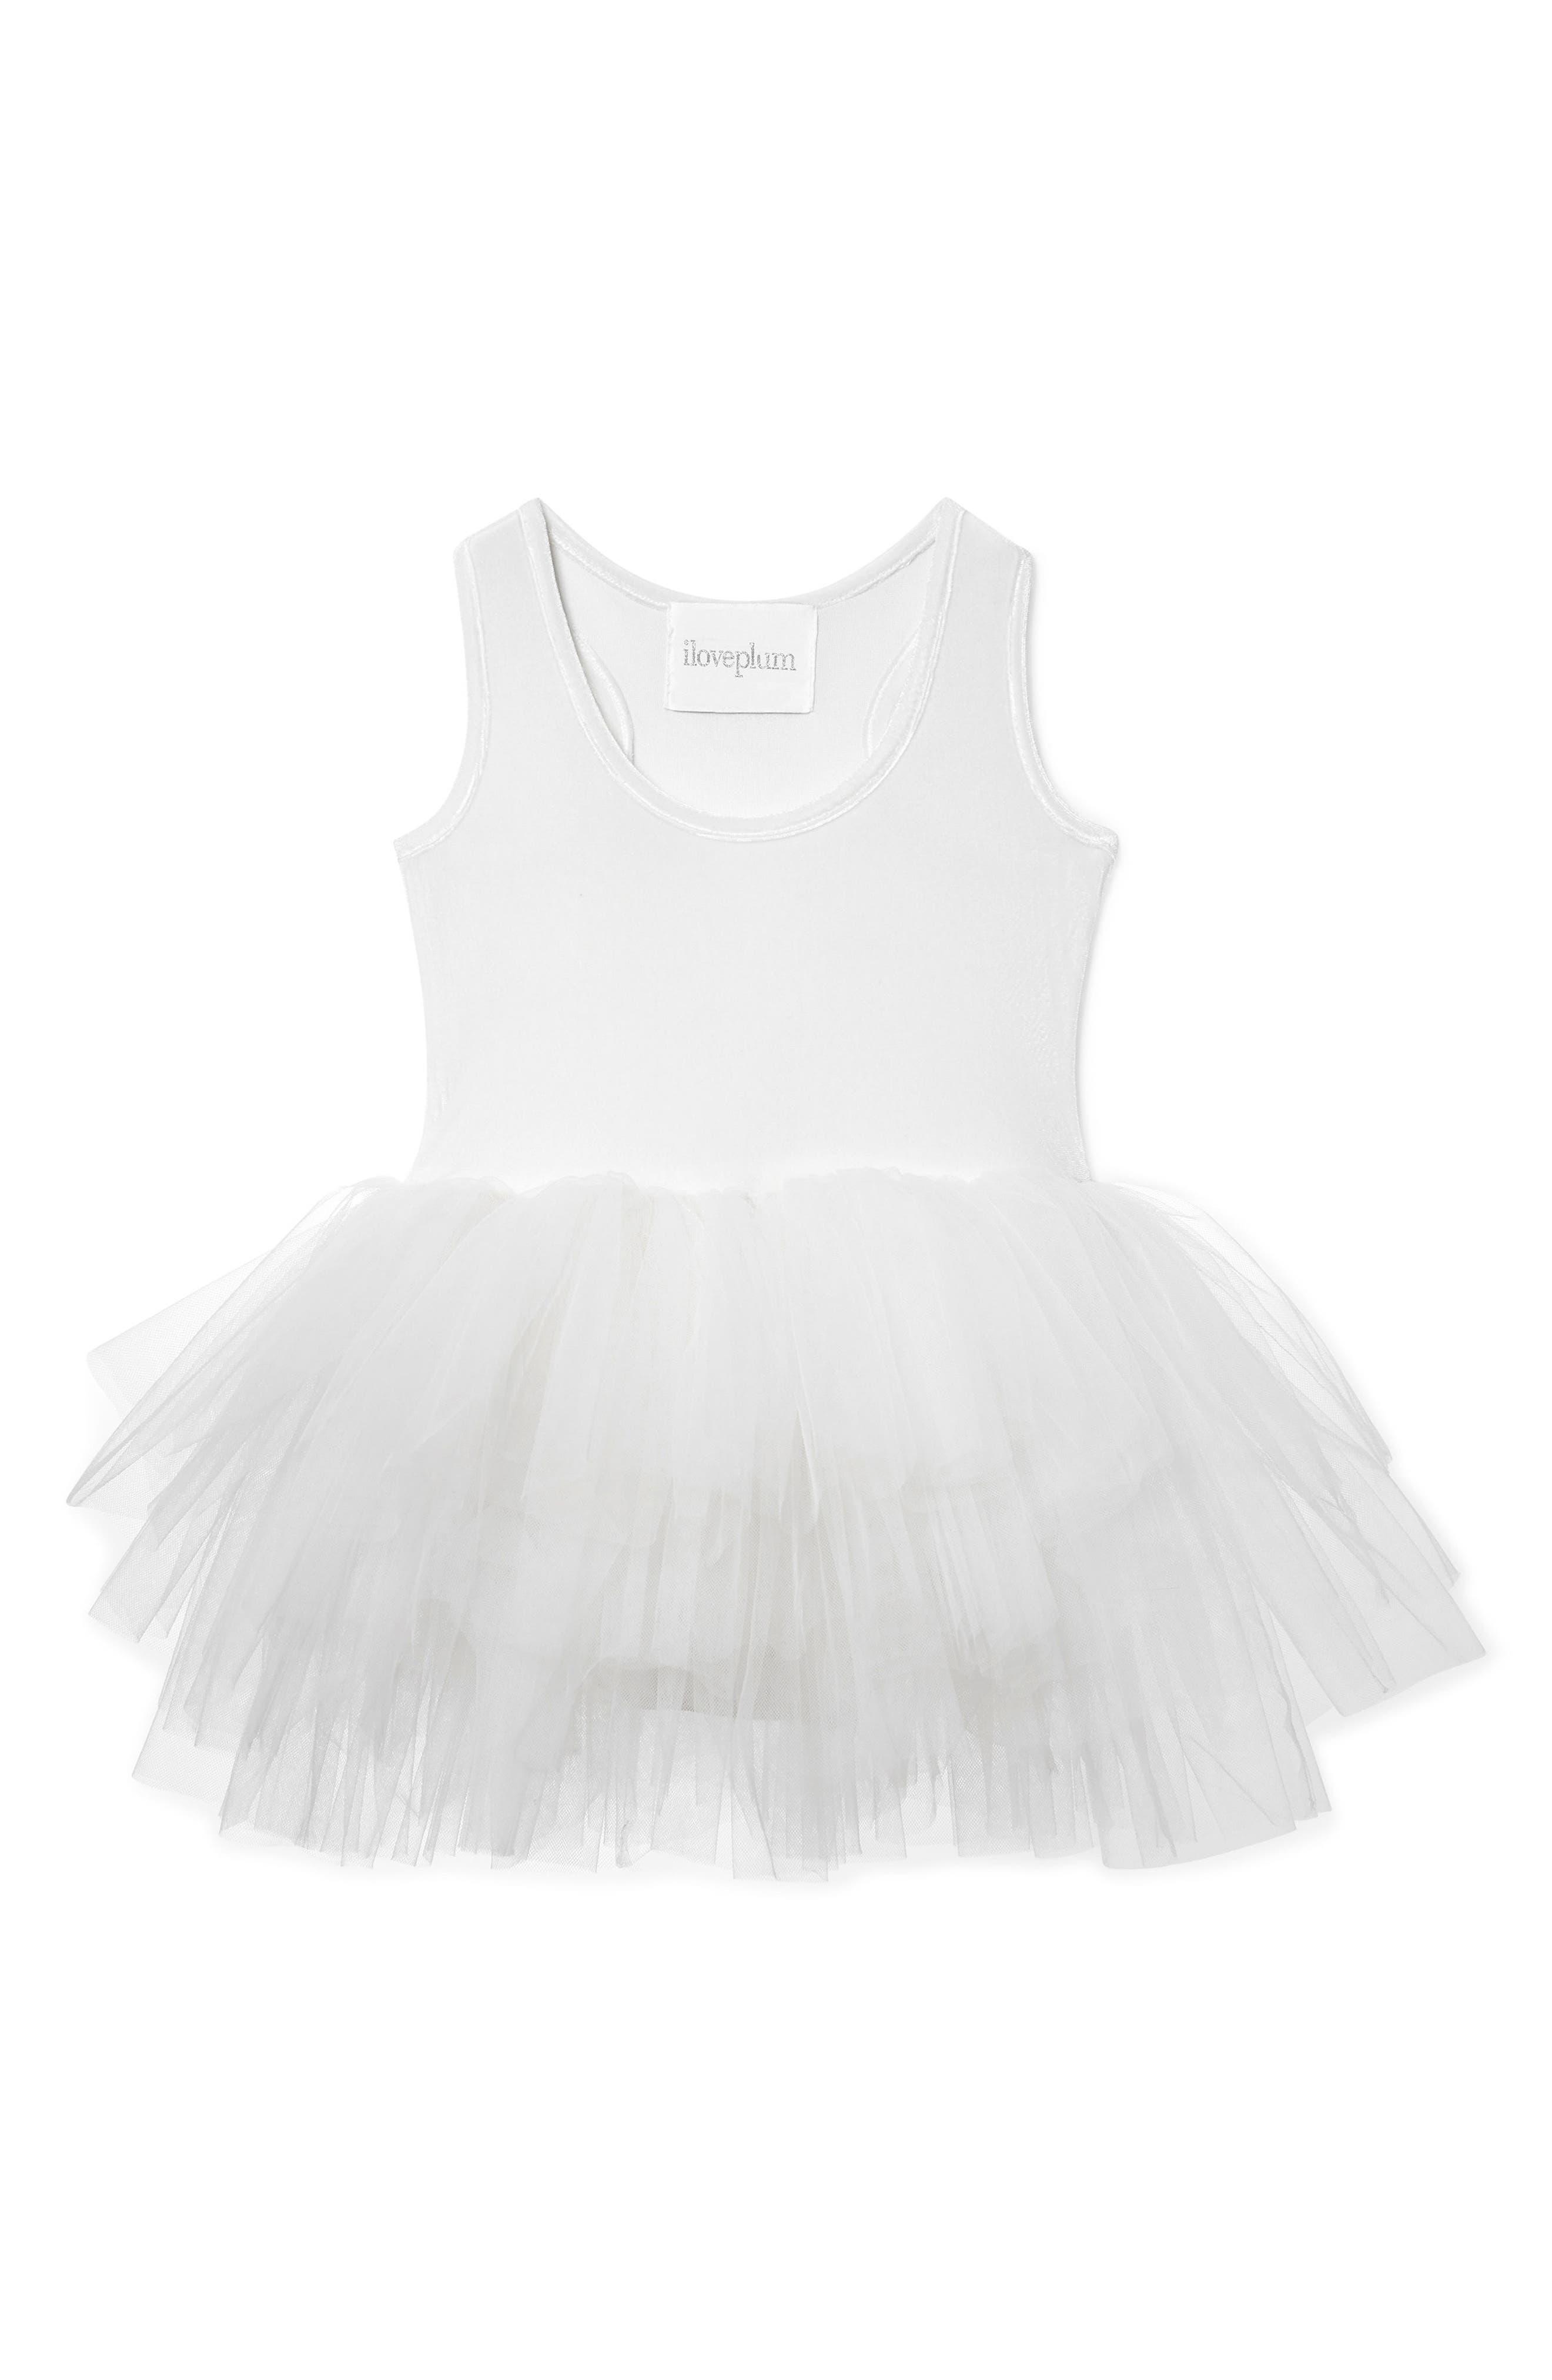 Alternate Image 1 Selected - iloveplum Tutu Dress (Toddler Girls, Little Girls & Big Girls)